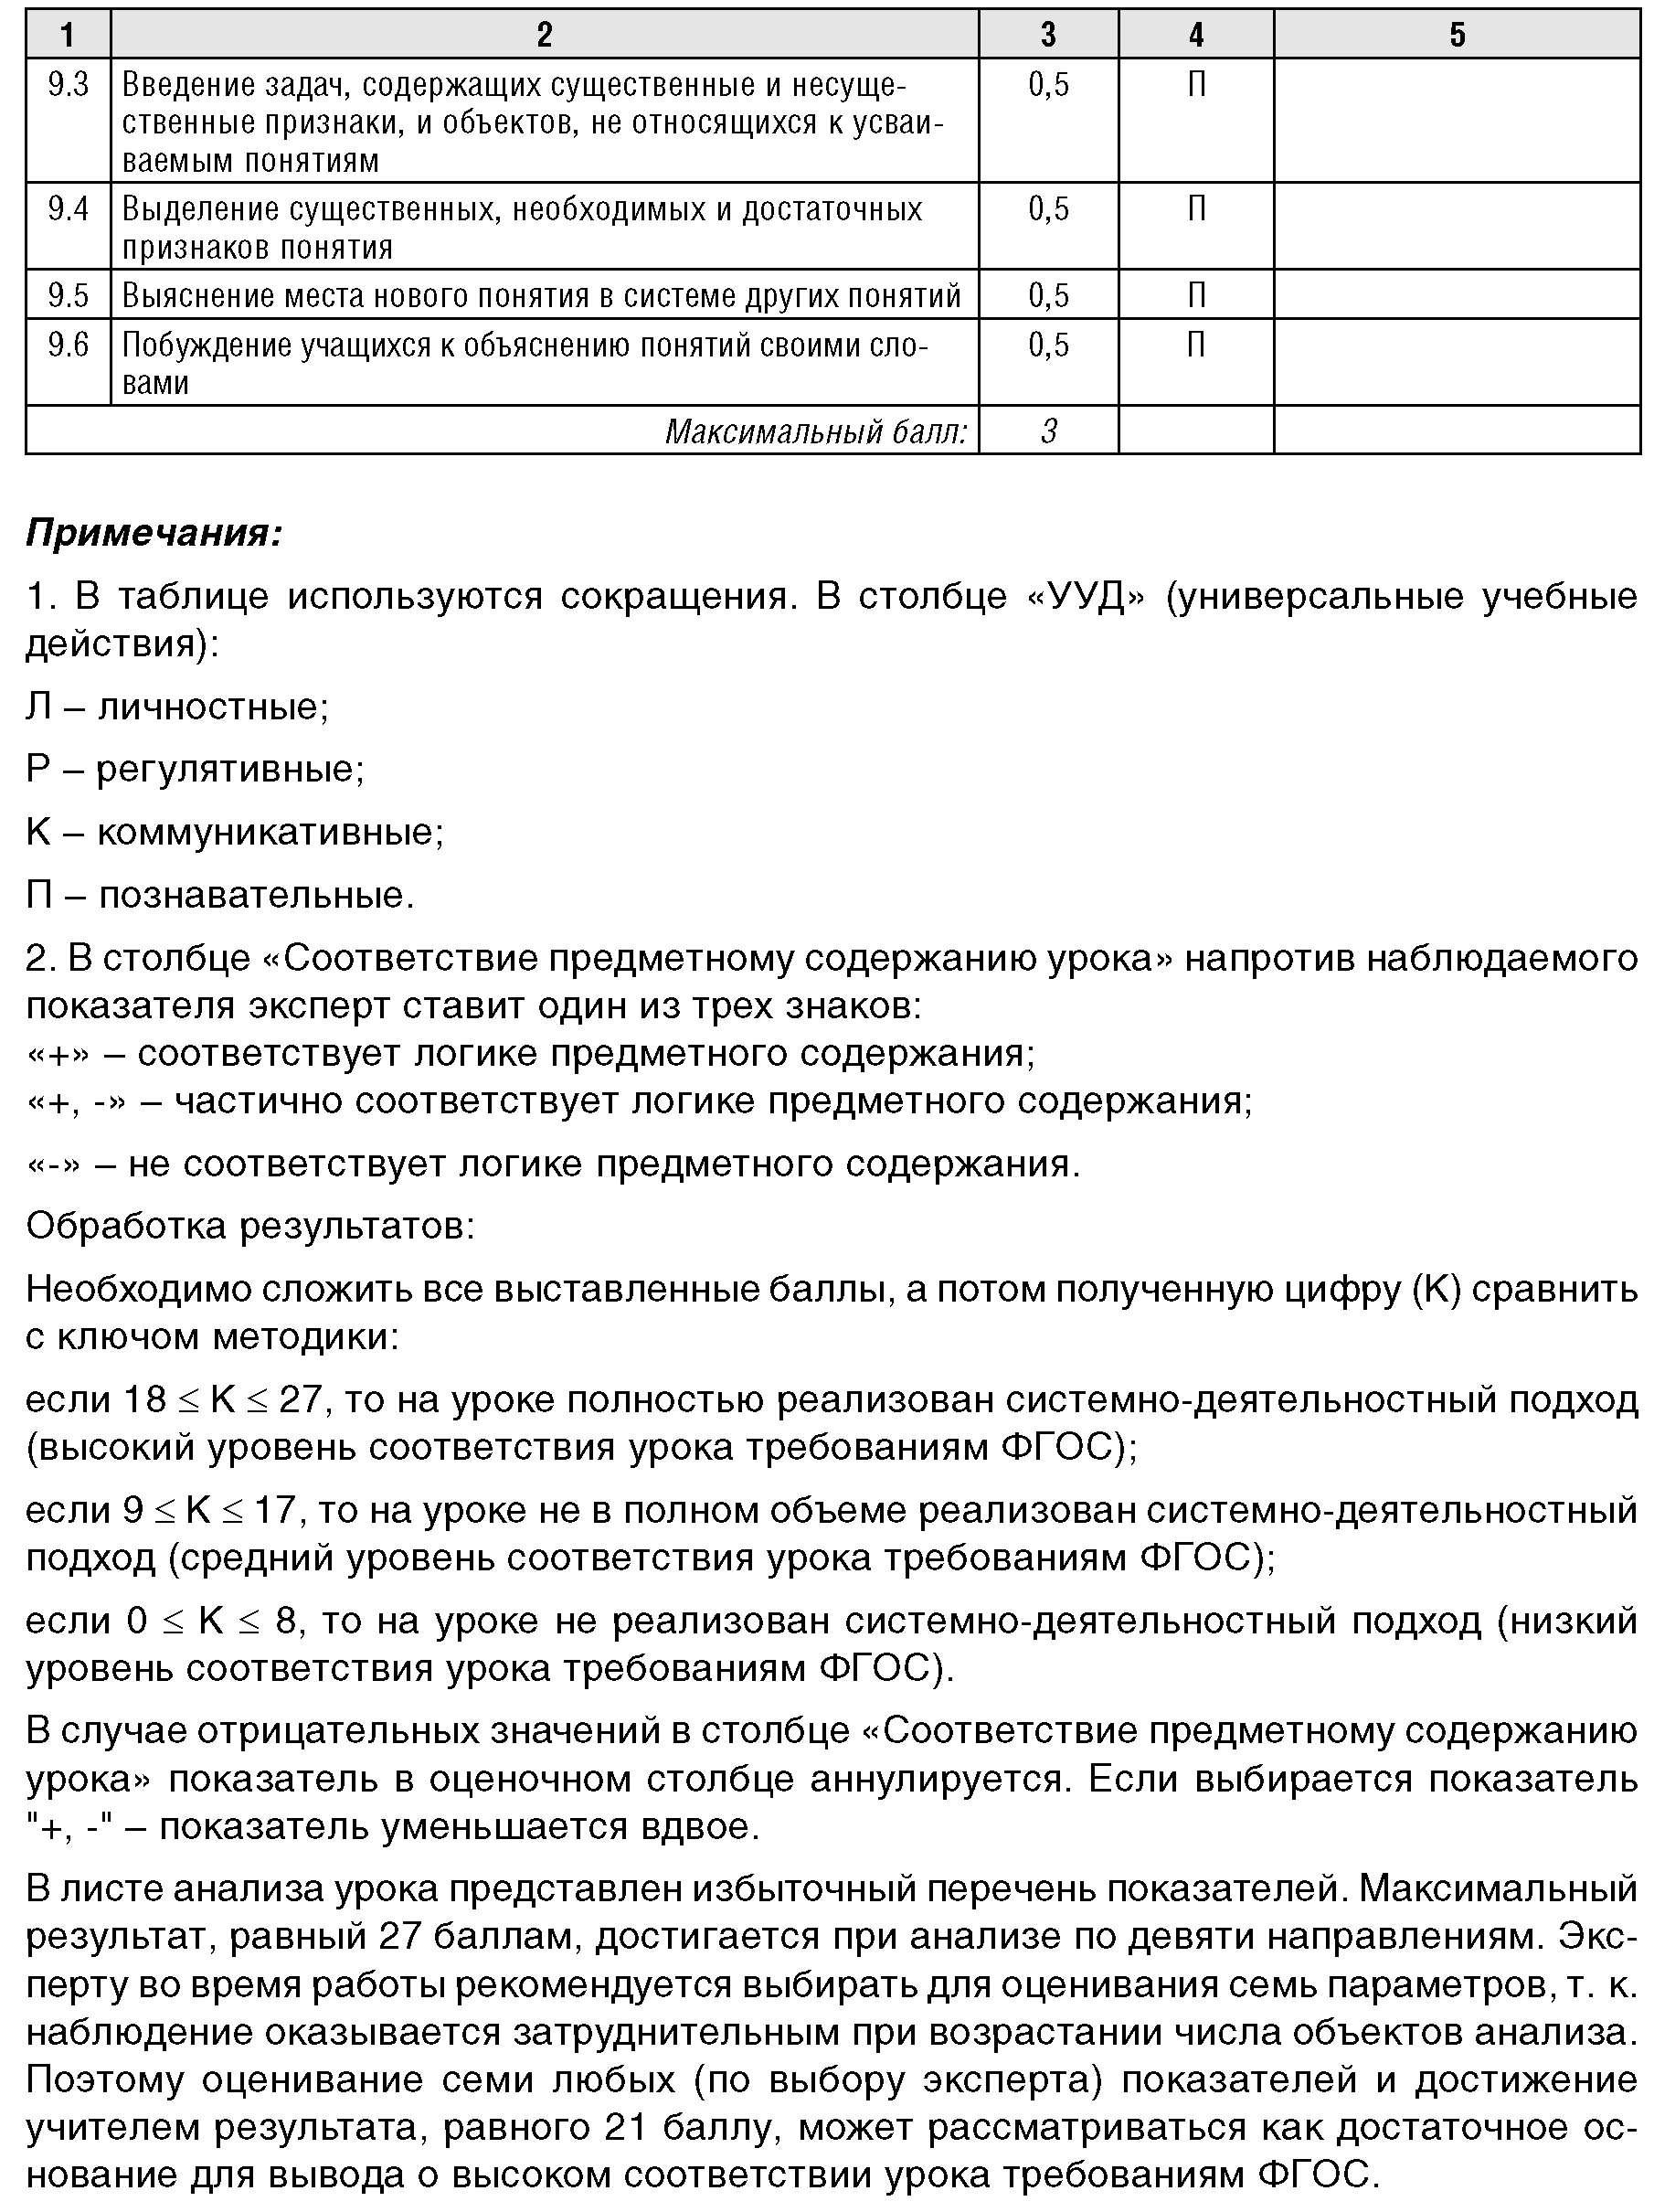 Схема анализа урока по фгос ооо 825